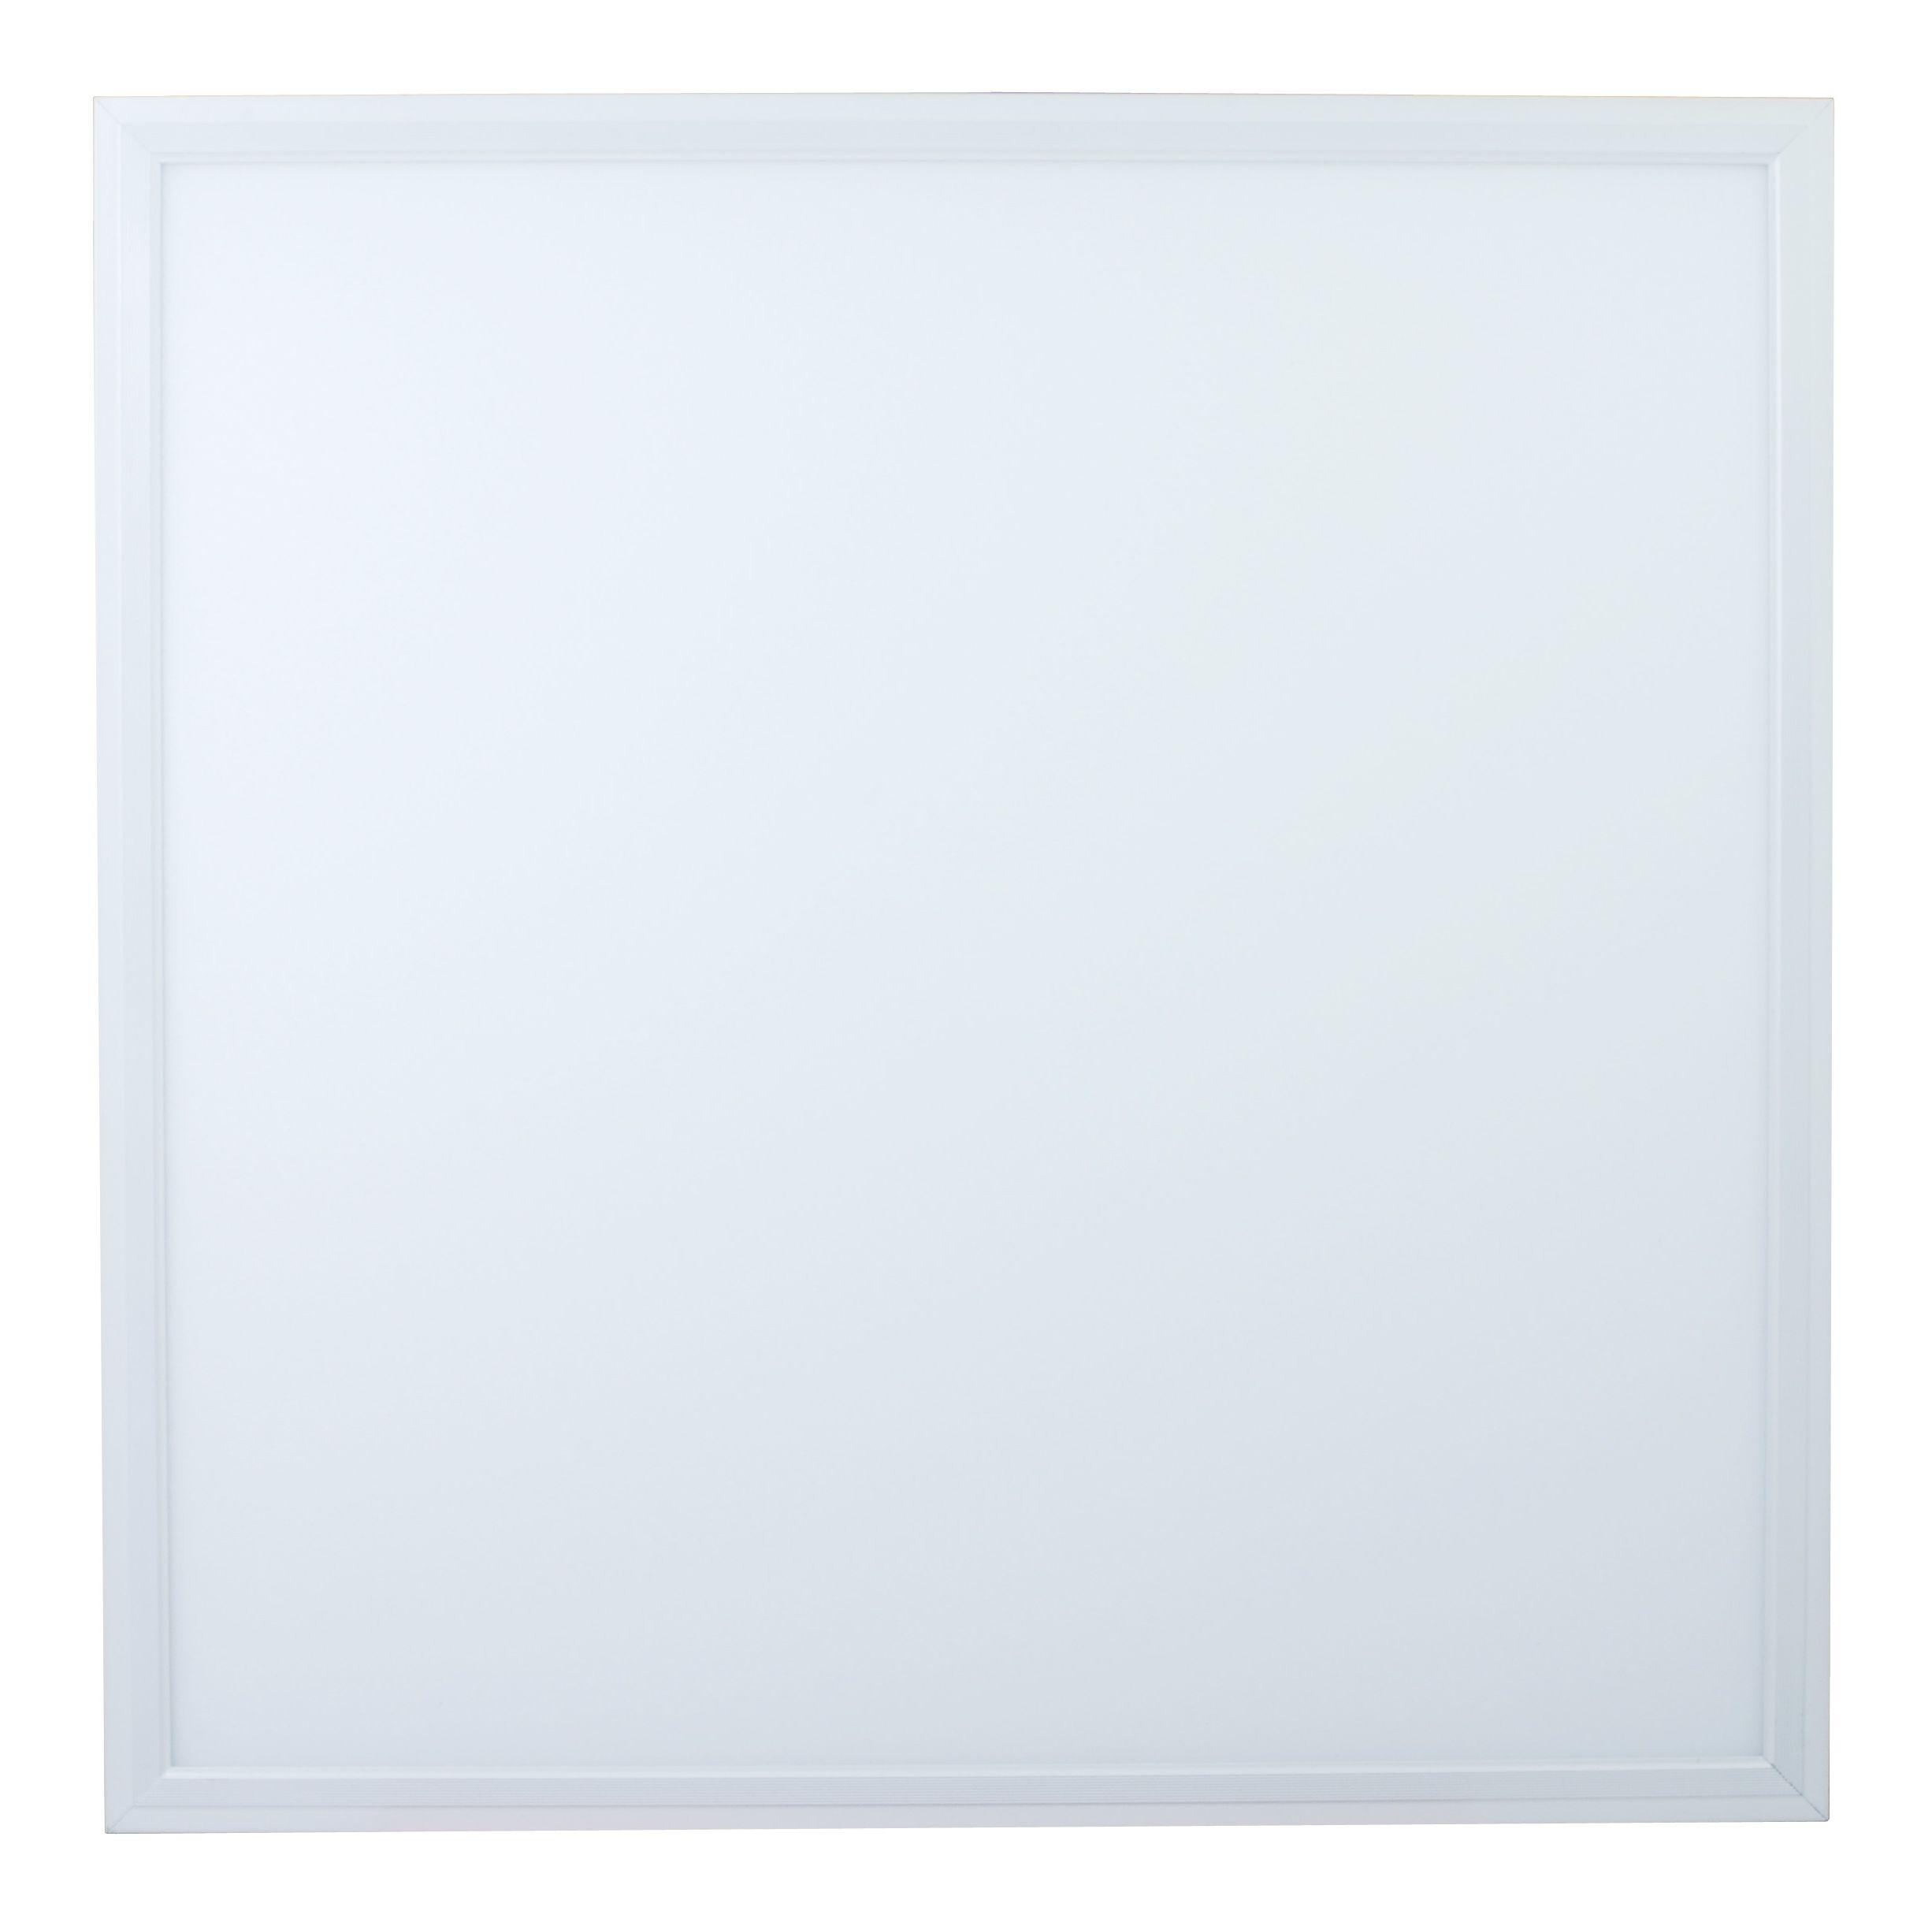 LED Solution Biely podhľadový LED panel 600 x 600mm 40W Premium - POSLEDNÝ KUS VYP2